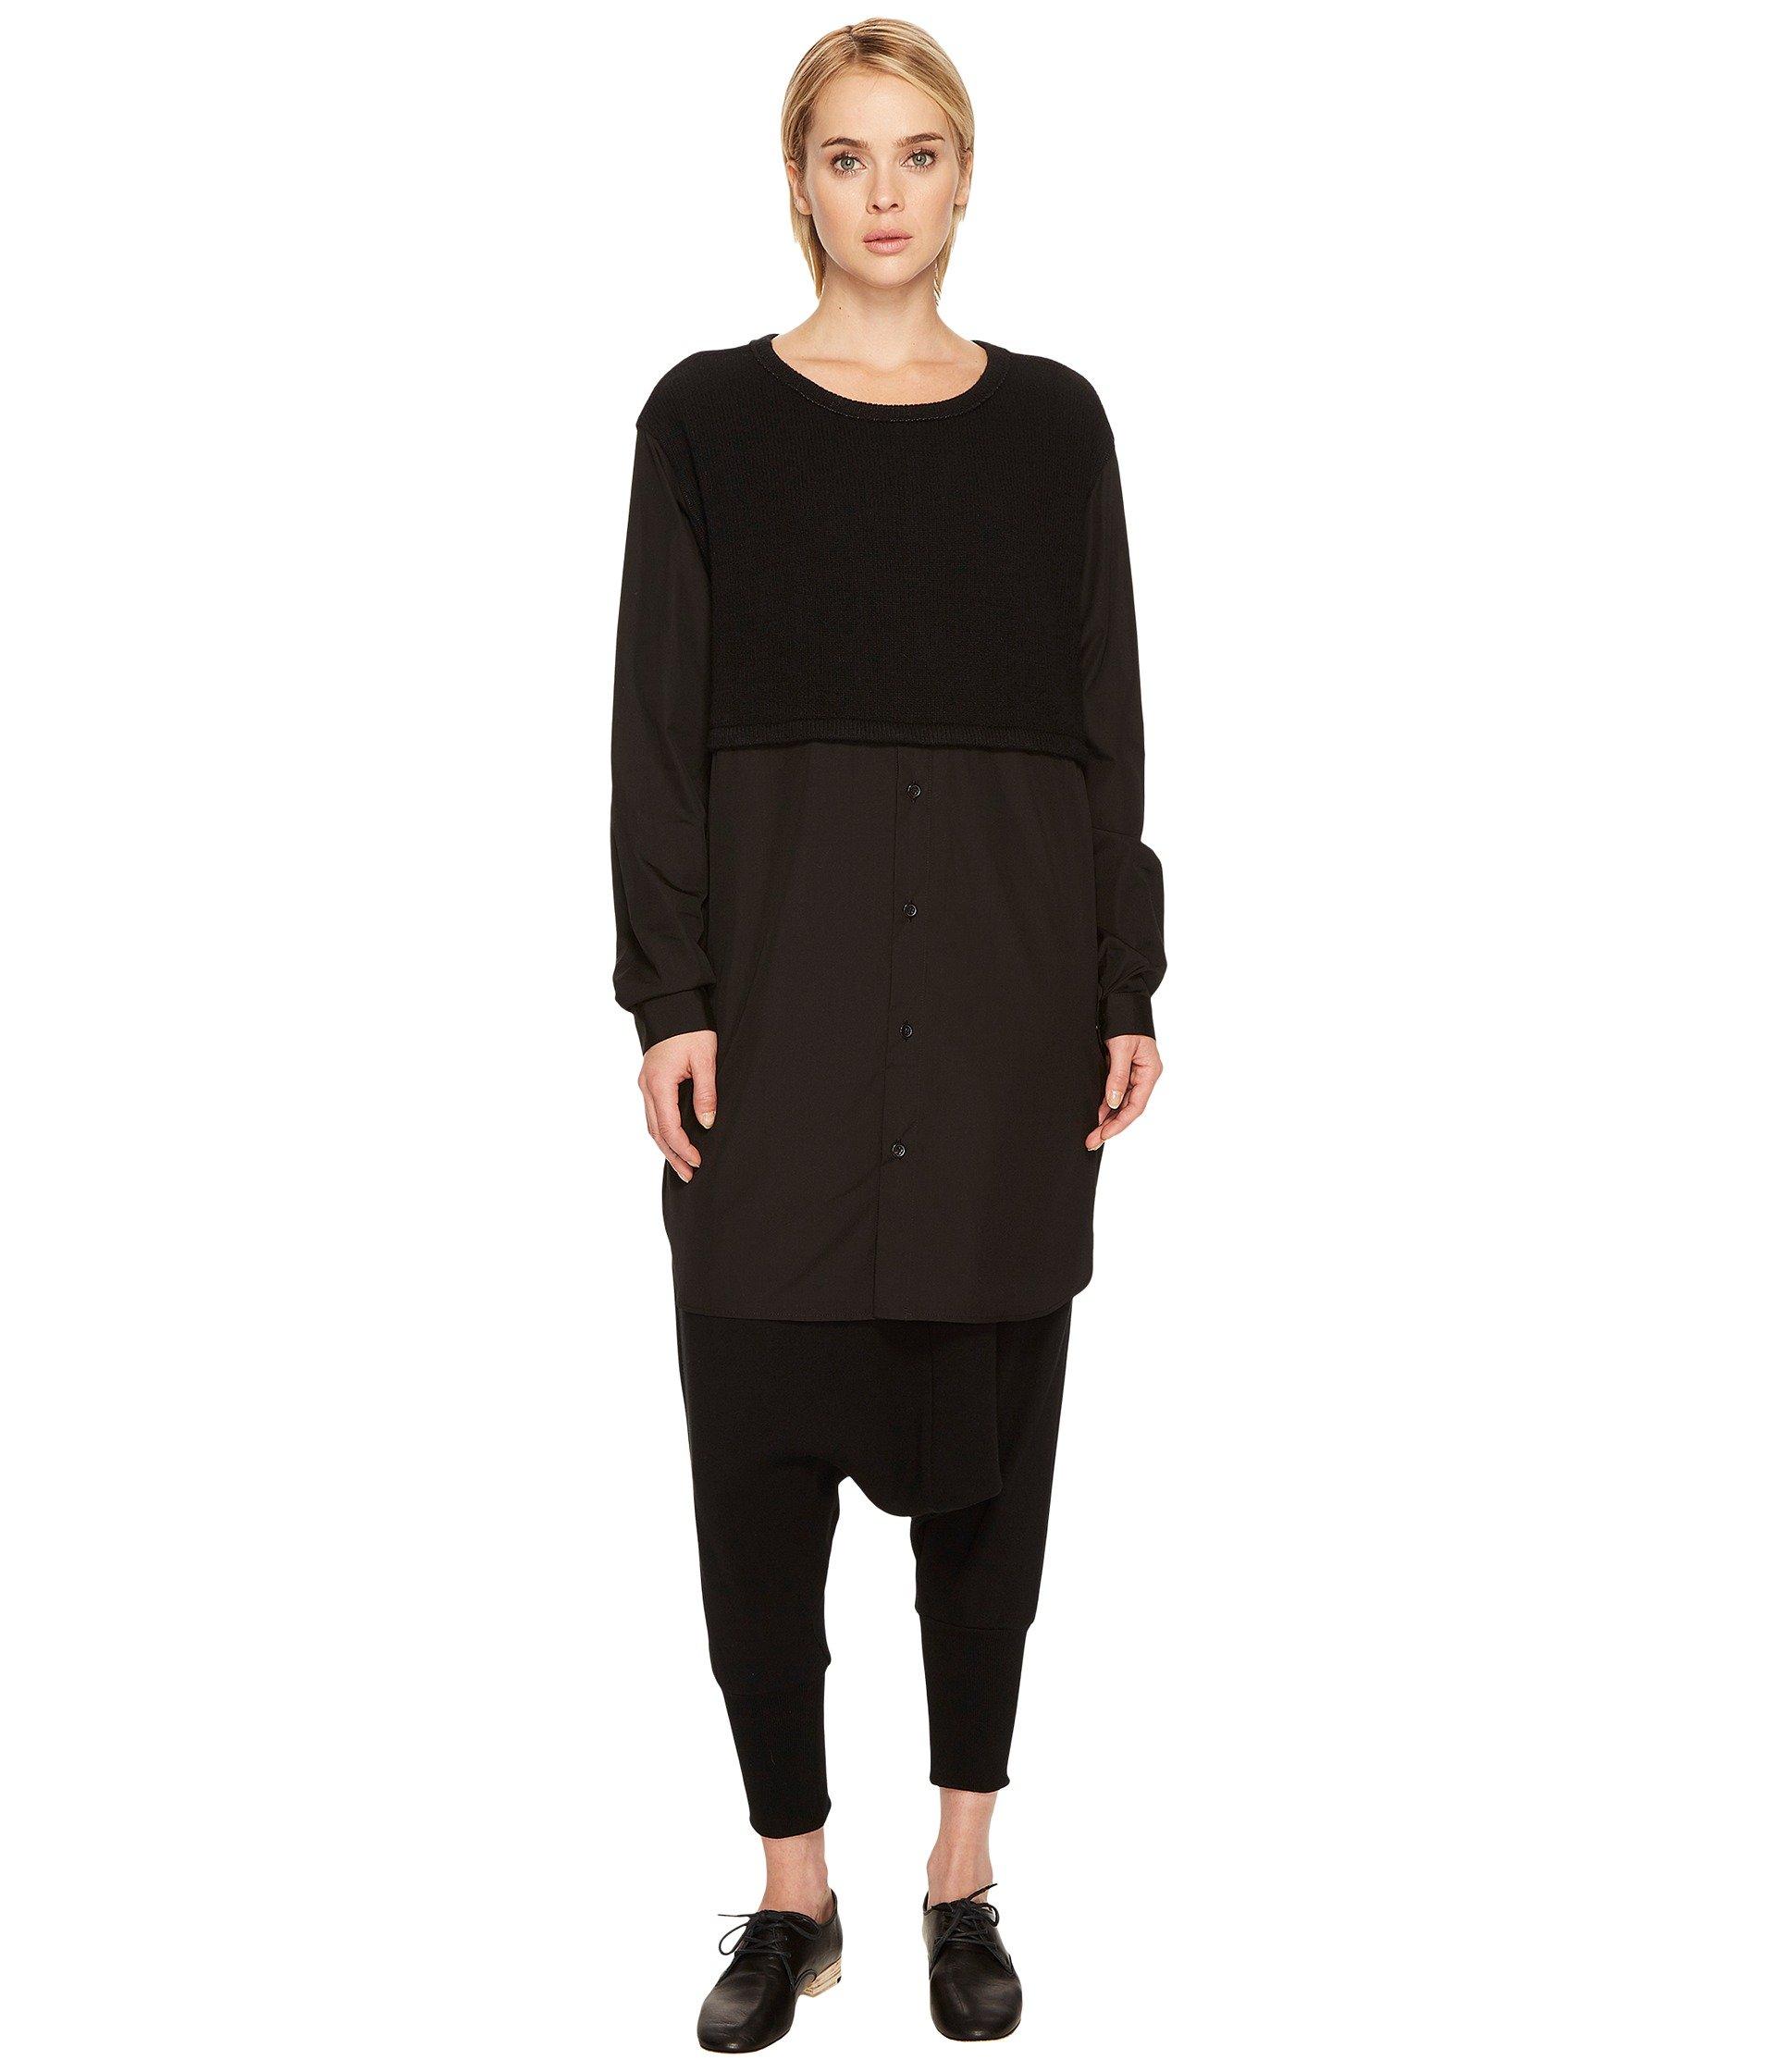 Saco para Mujer Yand#39;s by Yohji Yamamoto O-C/S Combi B Shirt Sweater  +